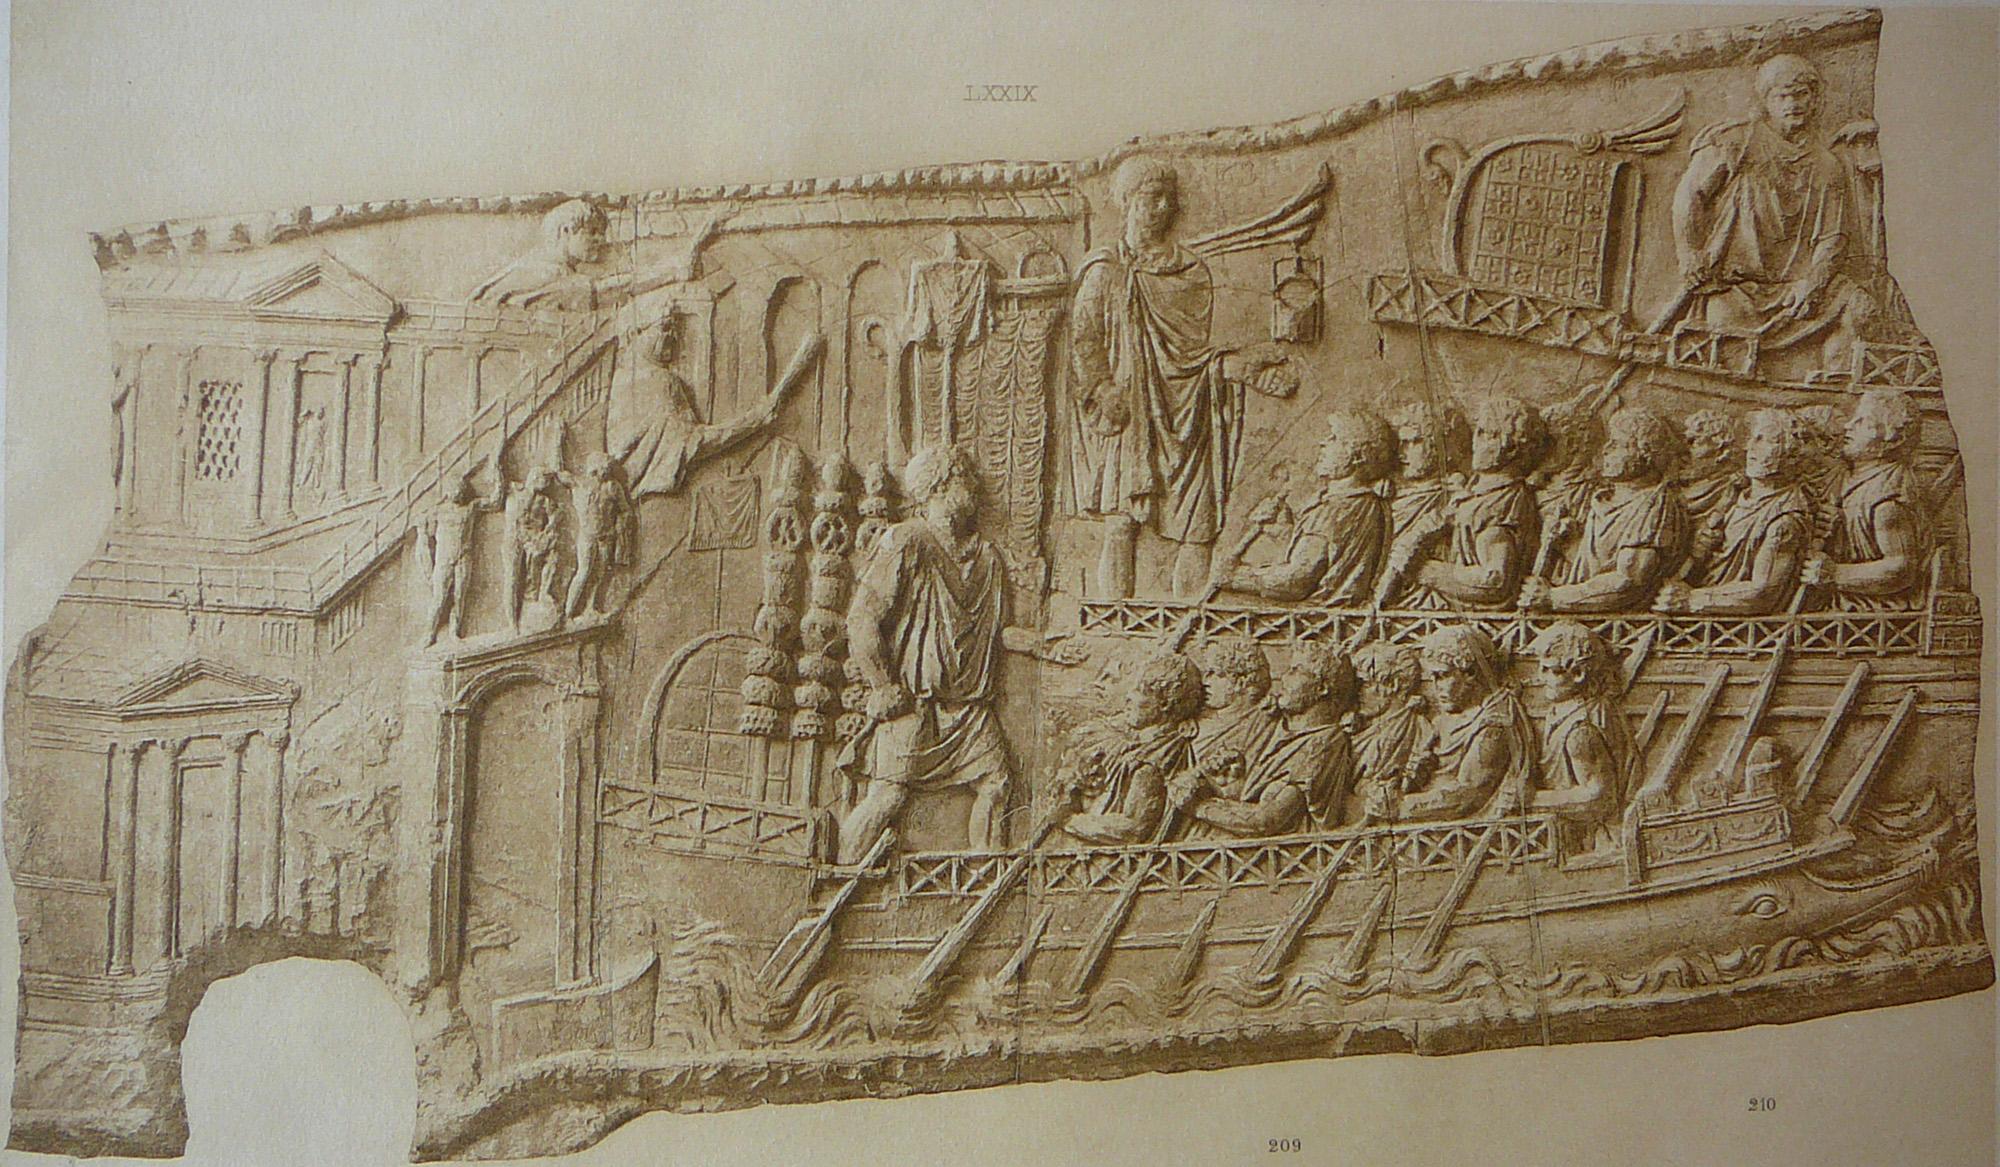 Liburnians of the Danube fleet during Trajan's Dacian Wars (BAs Relief from Trajan's column, 118 AD)